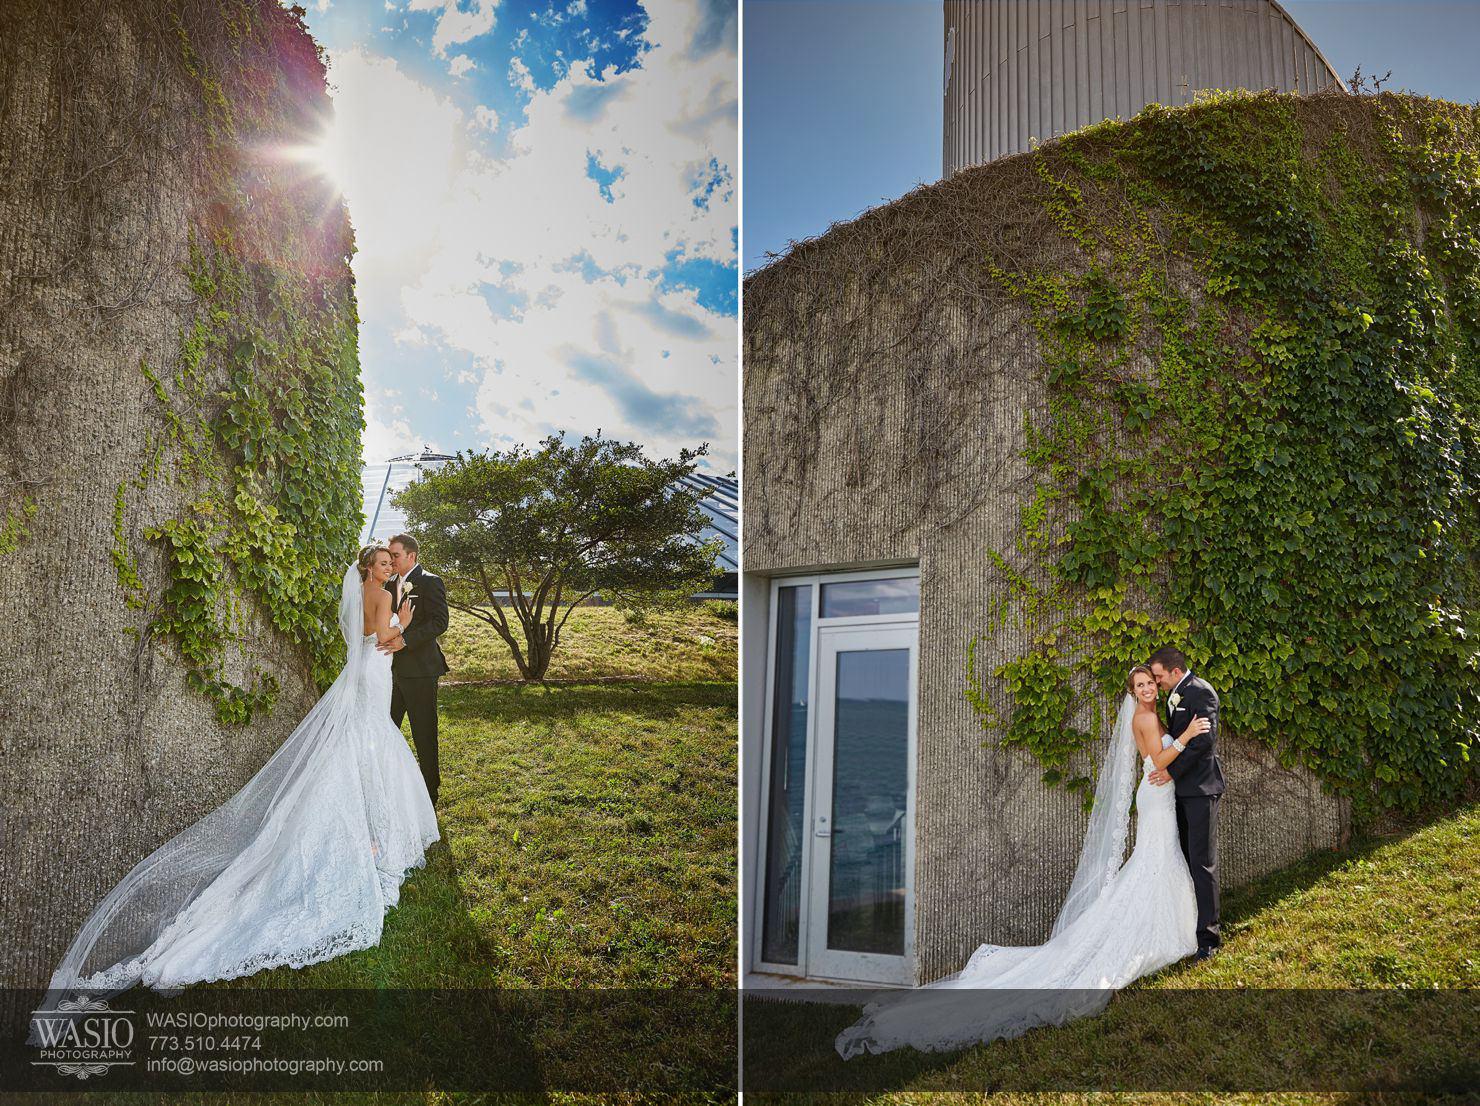 19_Chicago-Summer-Wedding_angelica-corrected1 Chicago Summer Wedding - Angelica & Pawel